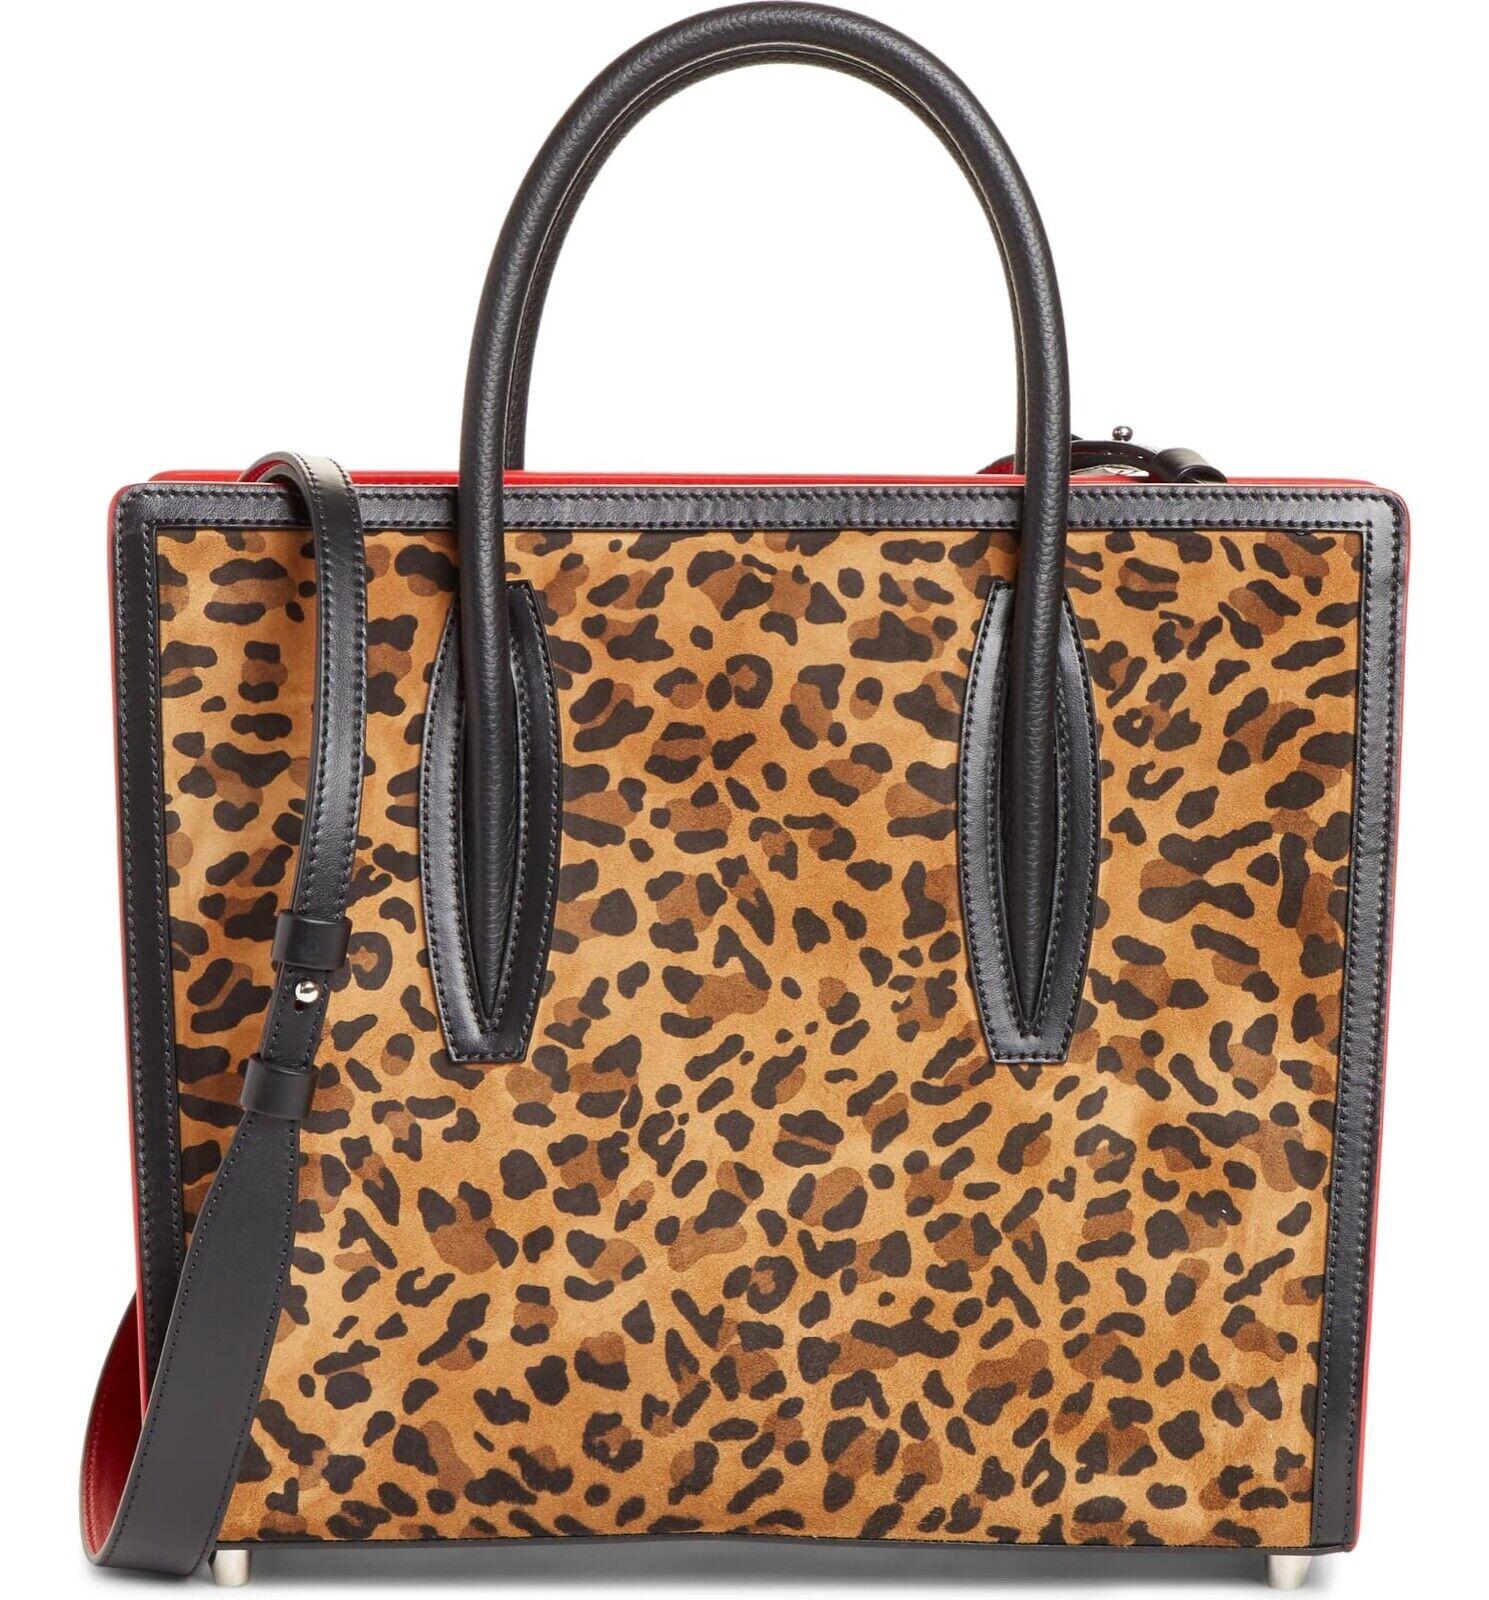 Christian Louboutin Paloma S Medium Black Red Brown Top Handle Tote Shoulder Bag